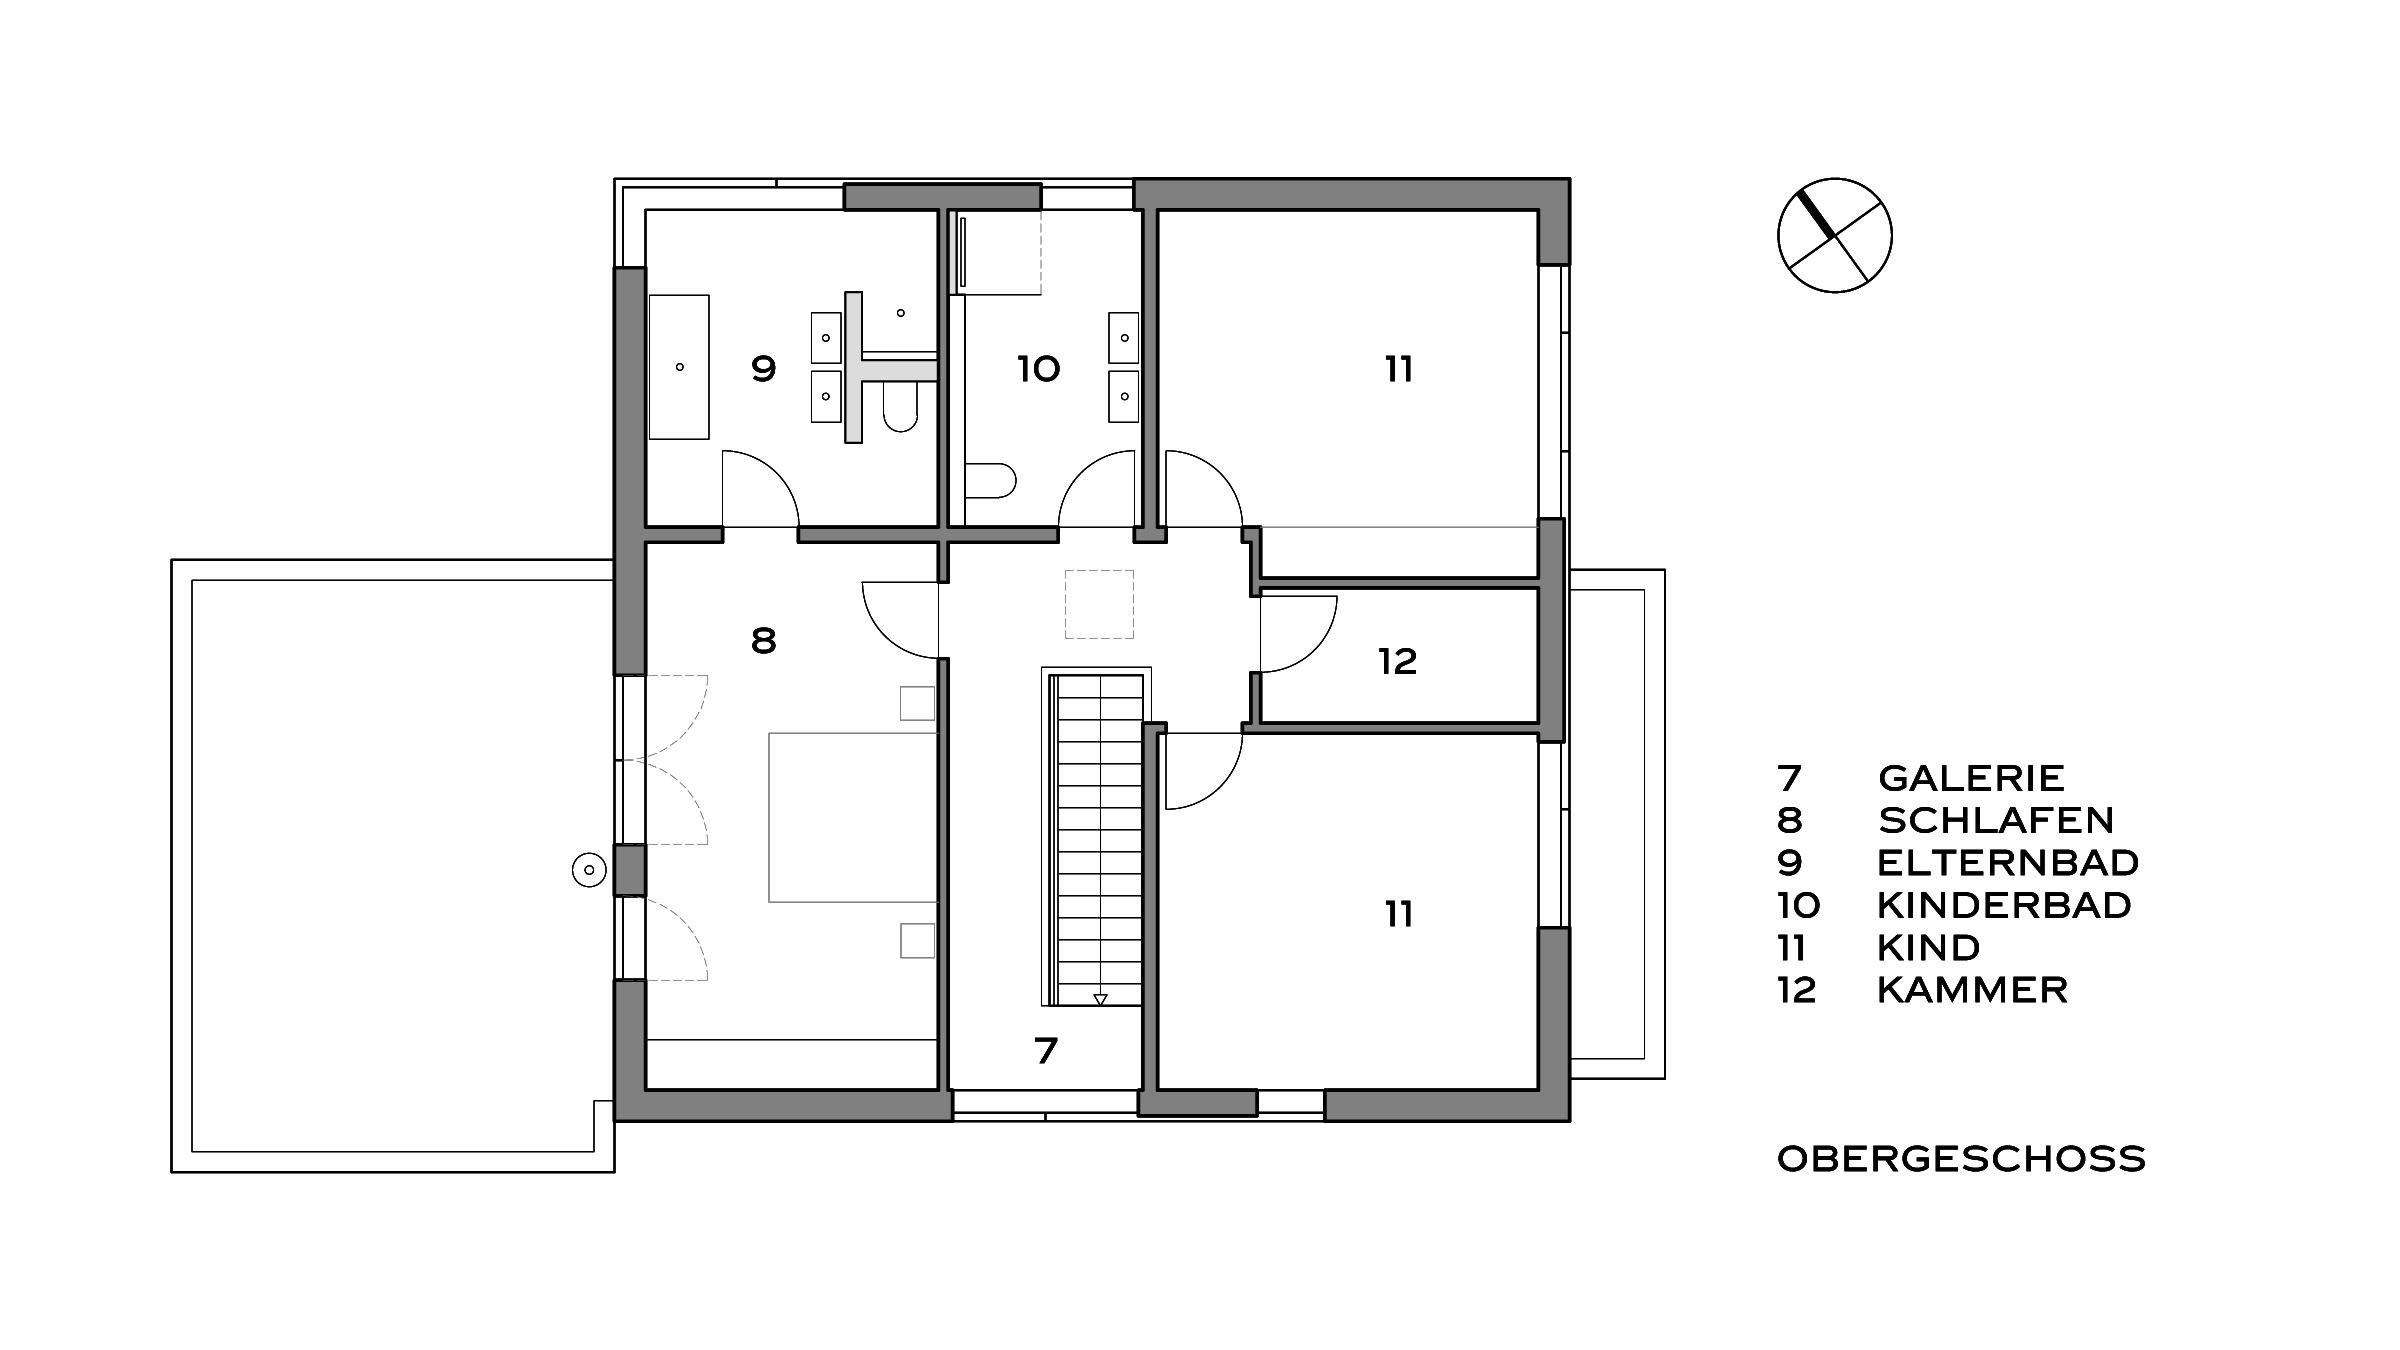 Modernes Einfamilienhaus in Potsdam Grundriss Obergeschoss